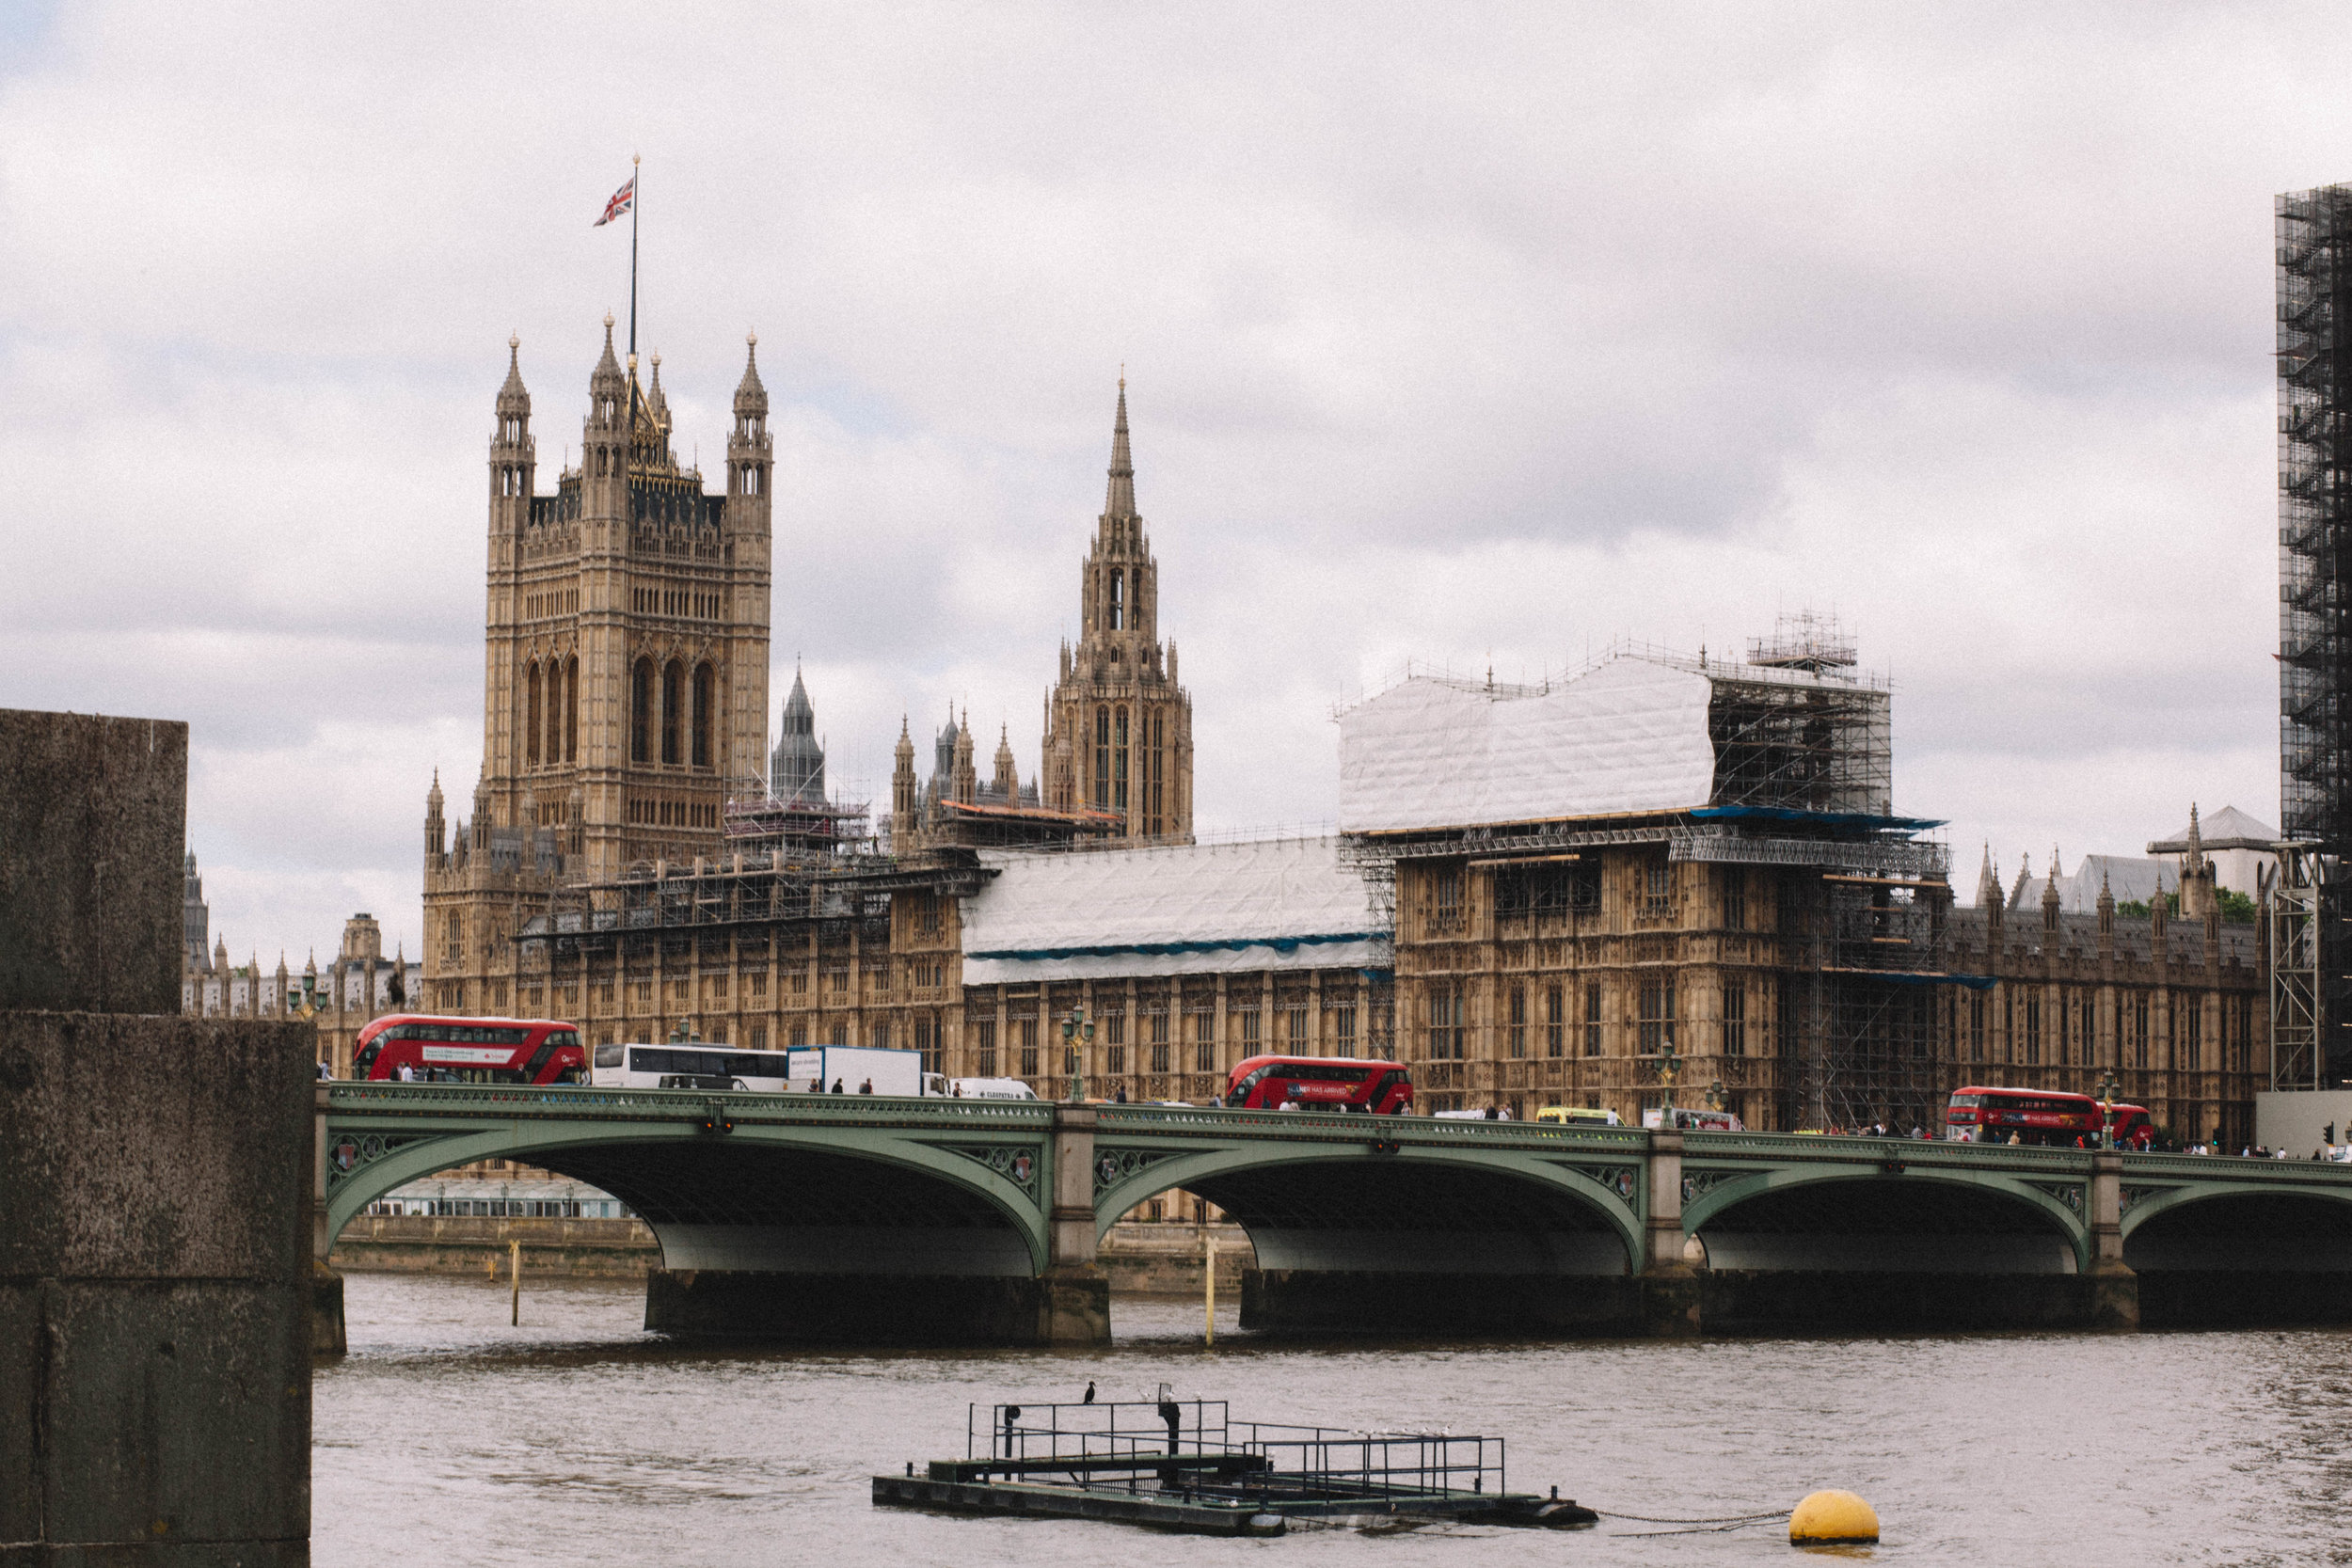 Parliament (Big Ben is currently under renovations so no good photos of him!)